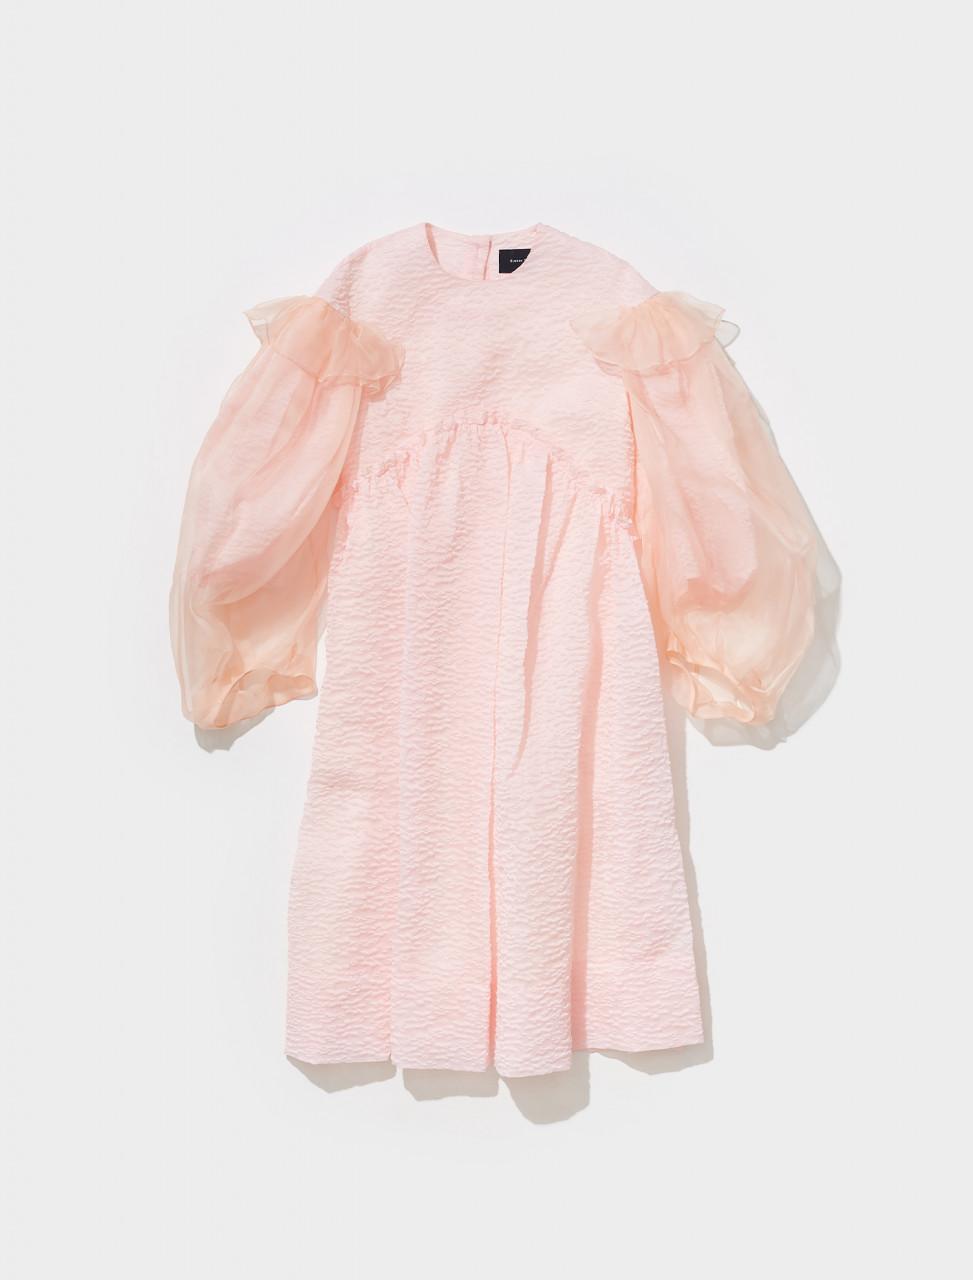 7101_0441 SIMONE ROCHA ORGANZA OVERLAY SIGNATURE SLEEVE SMOCK DRESS IN PINK